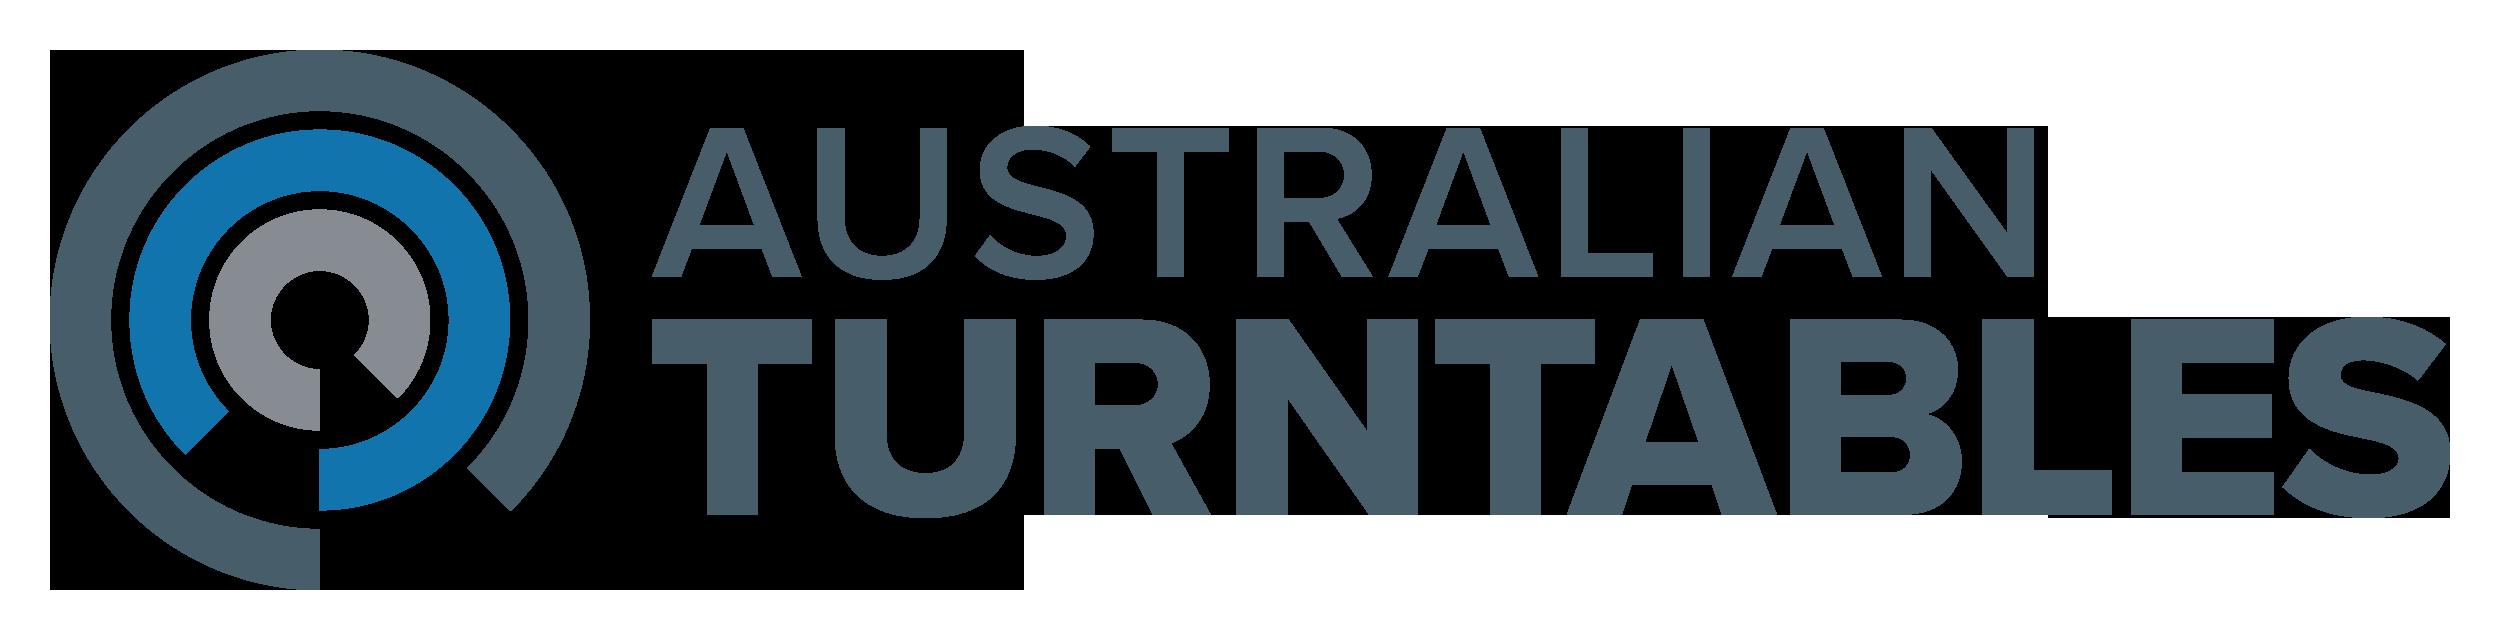 Australian Turntables